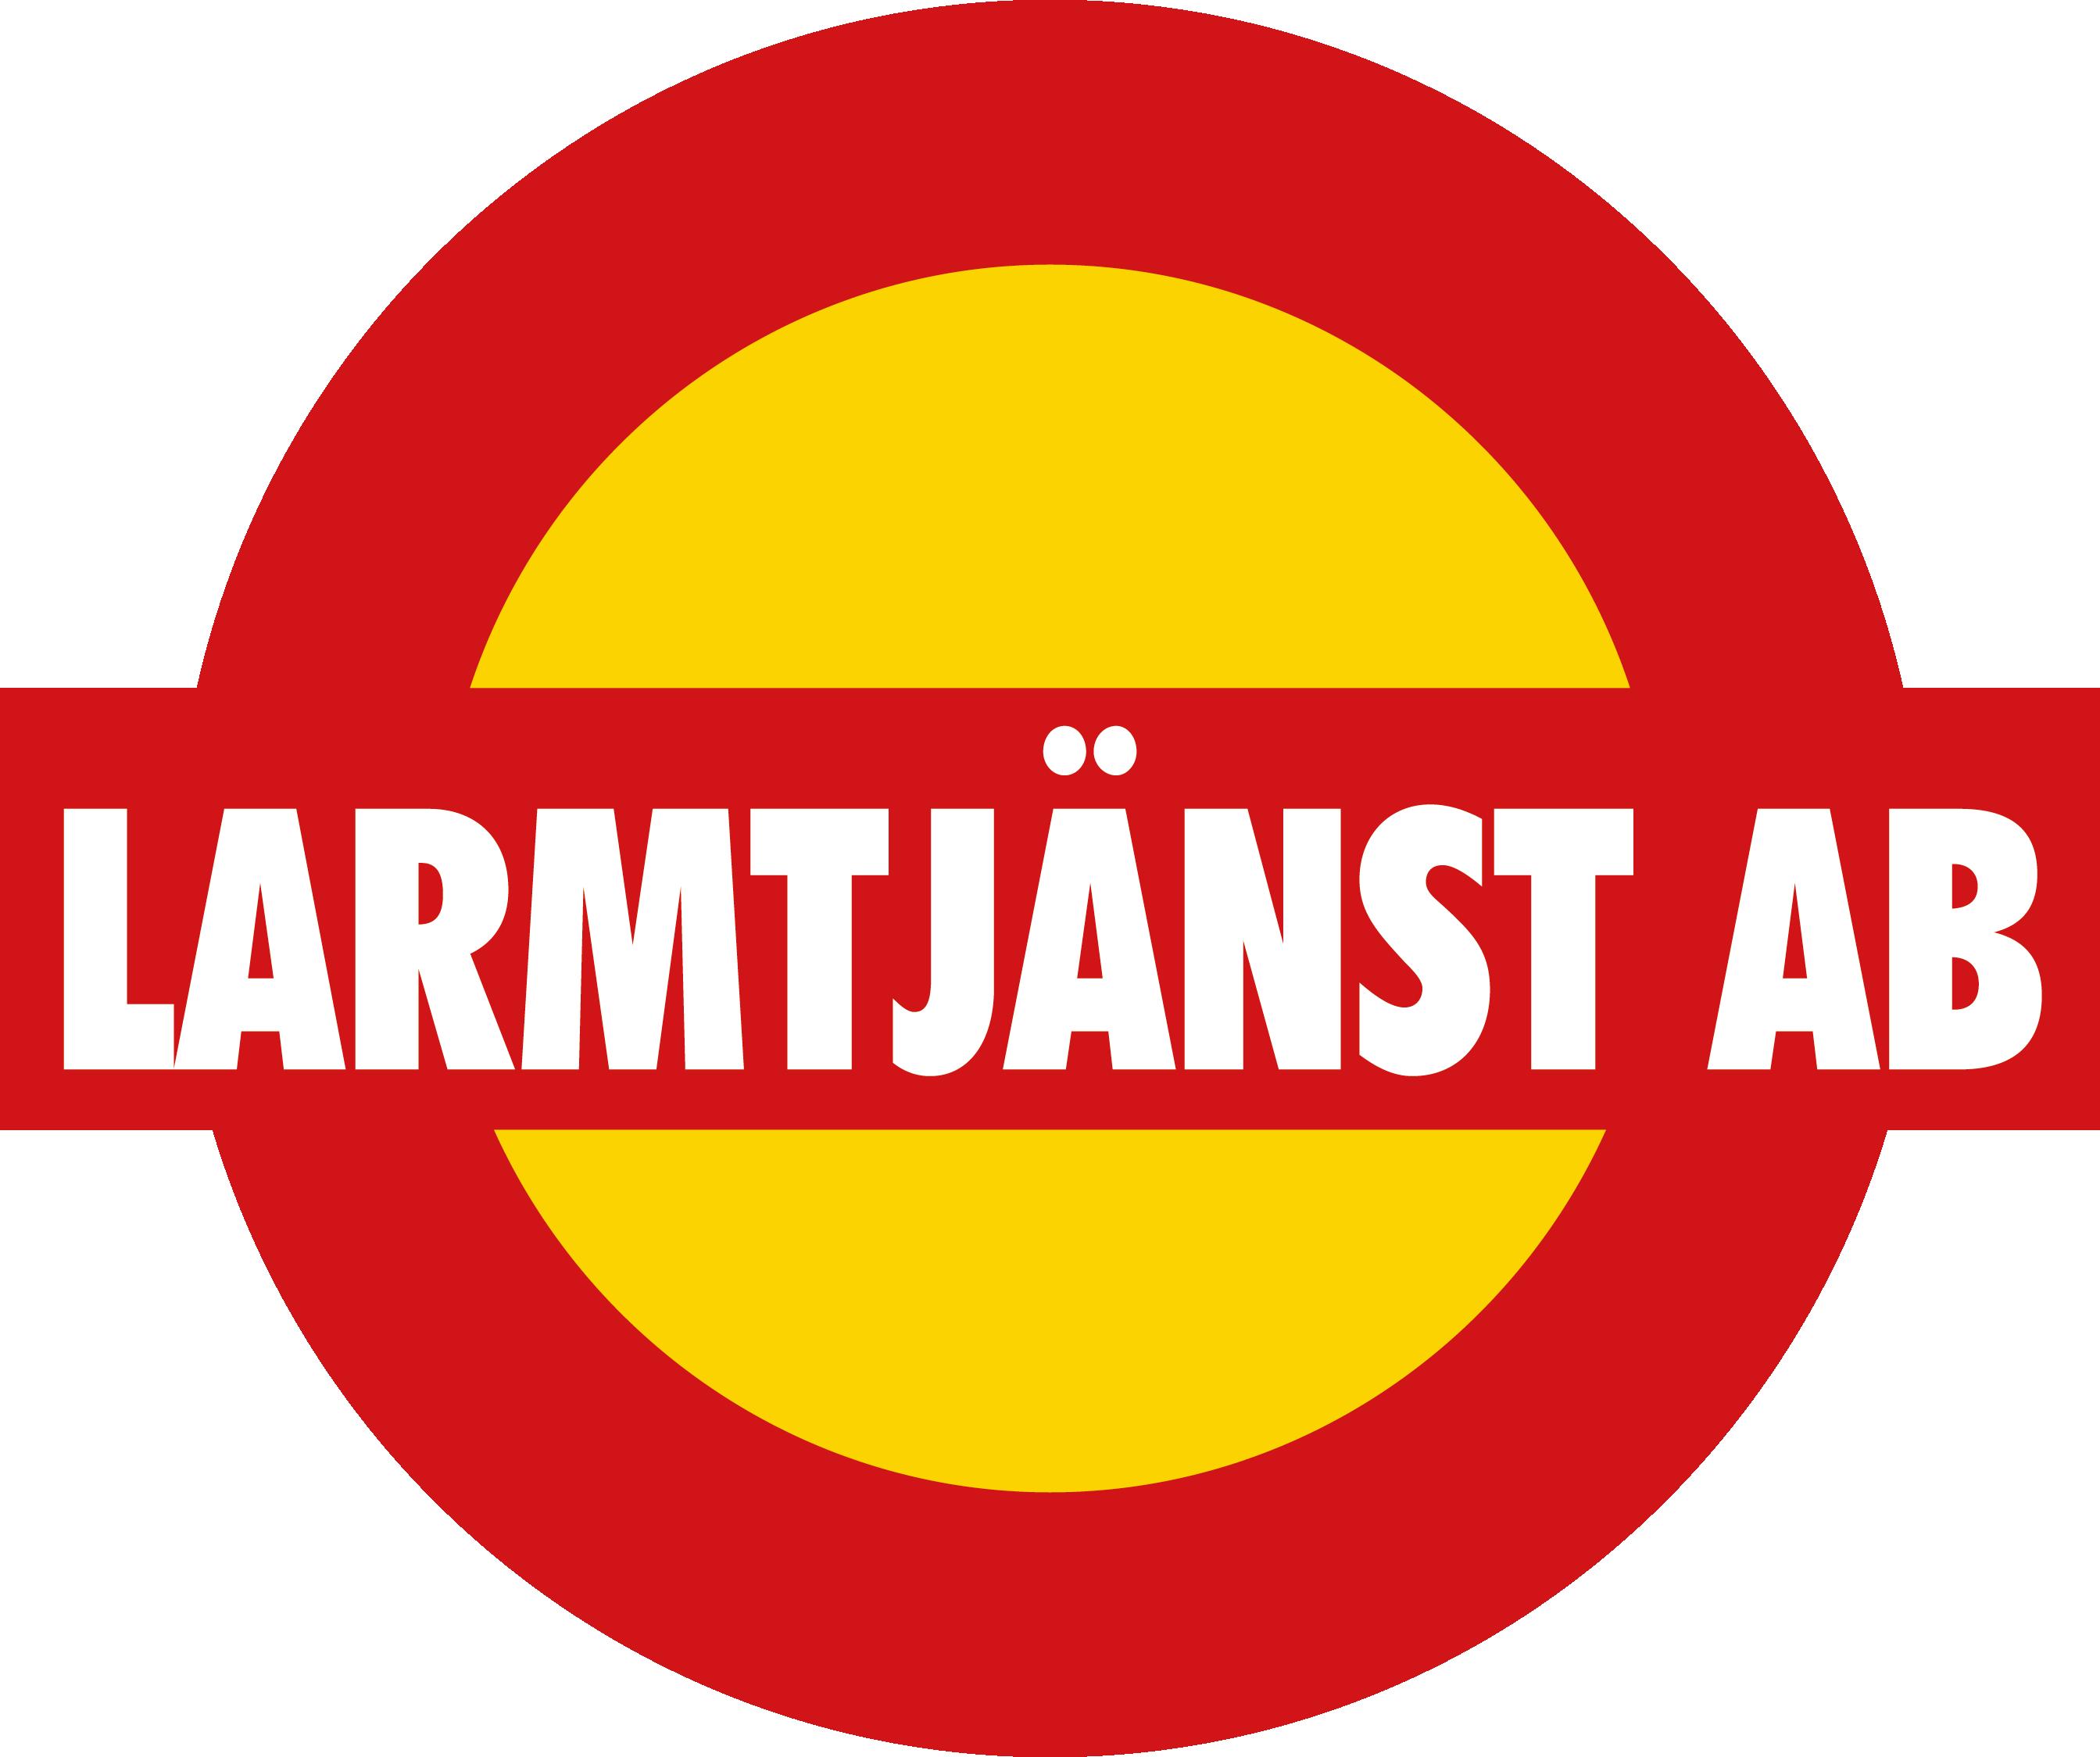 Larmtjänst AB